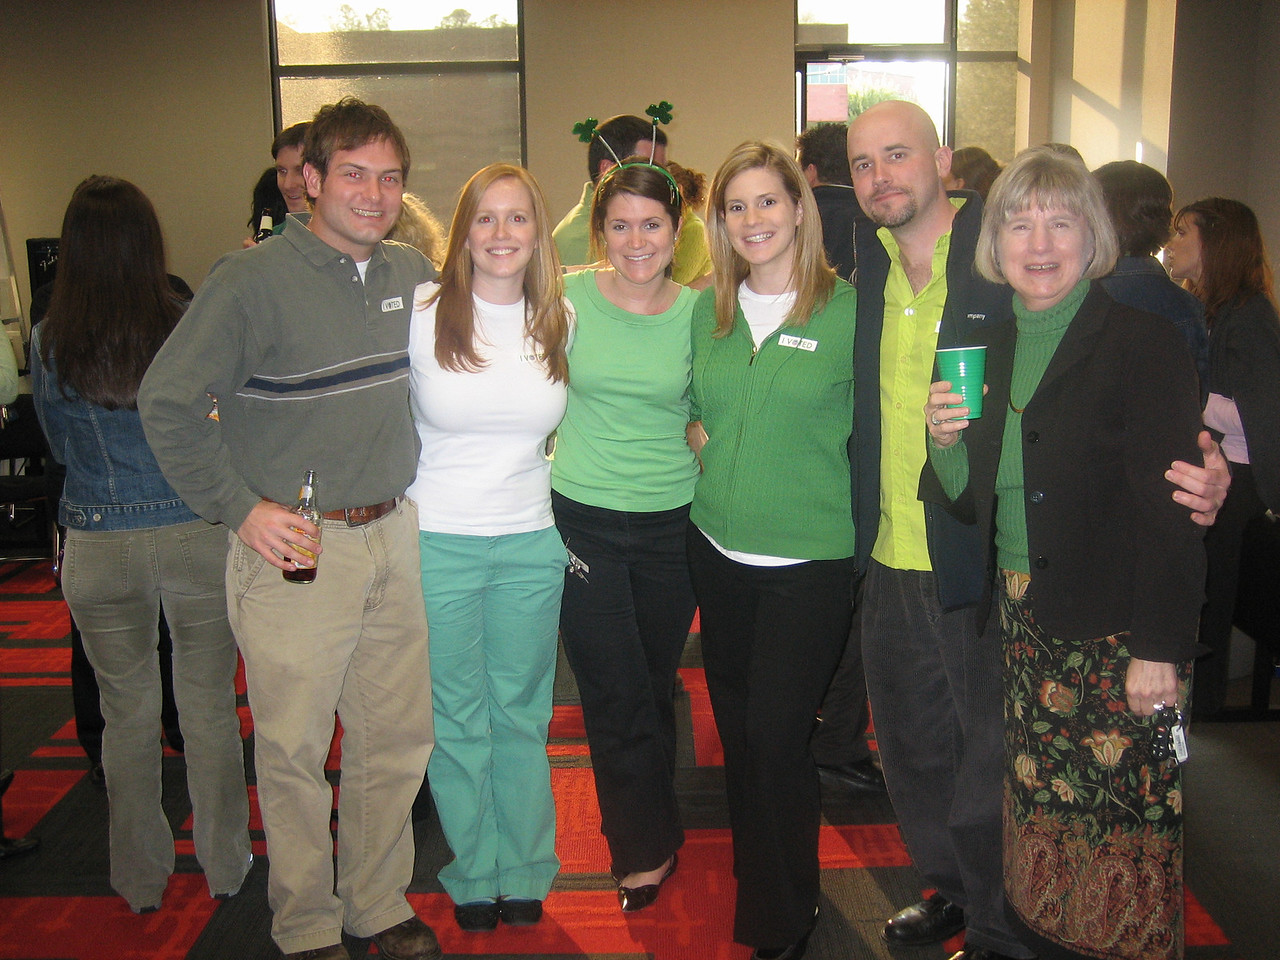 3/17/2006 - St. Patrick's Day Party - Jon Deutsch, Lauren Tipton, Ellen Brooks, Jennifer Williams, Shaun Irving, Libby Burton